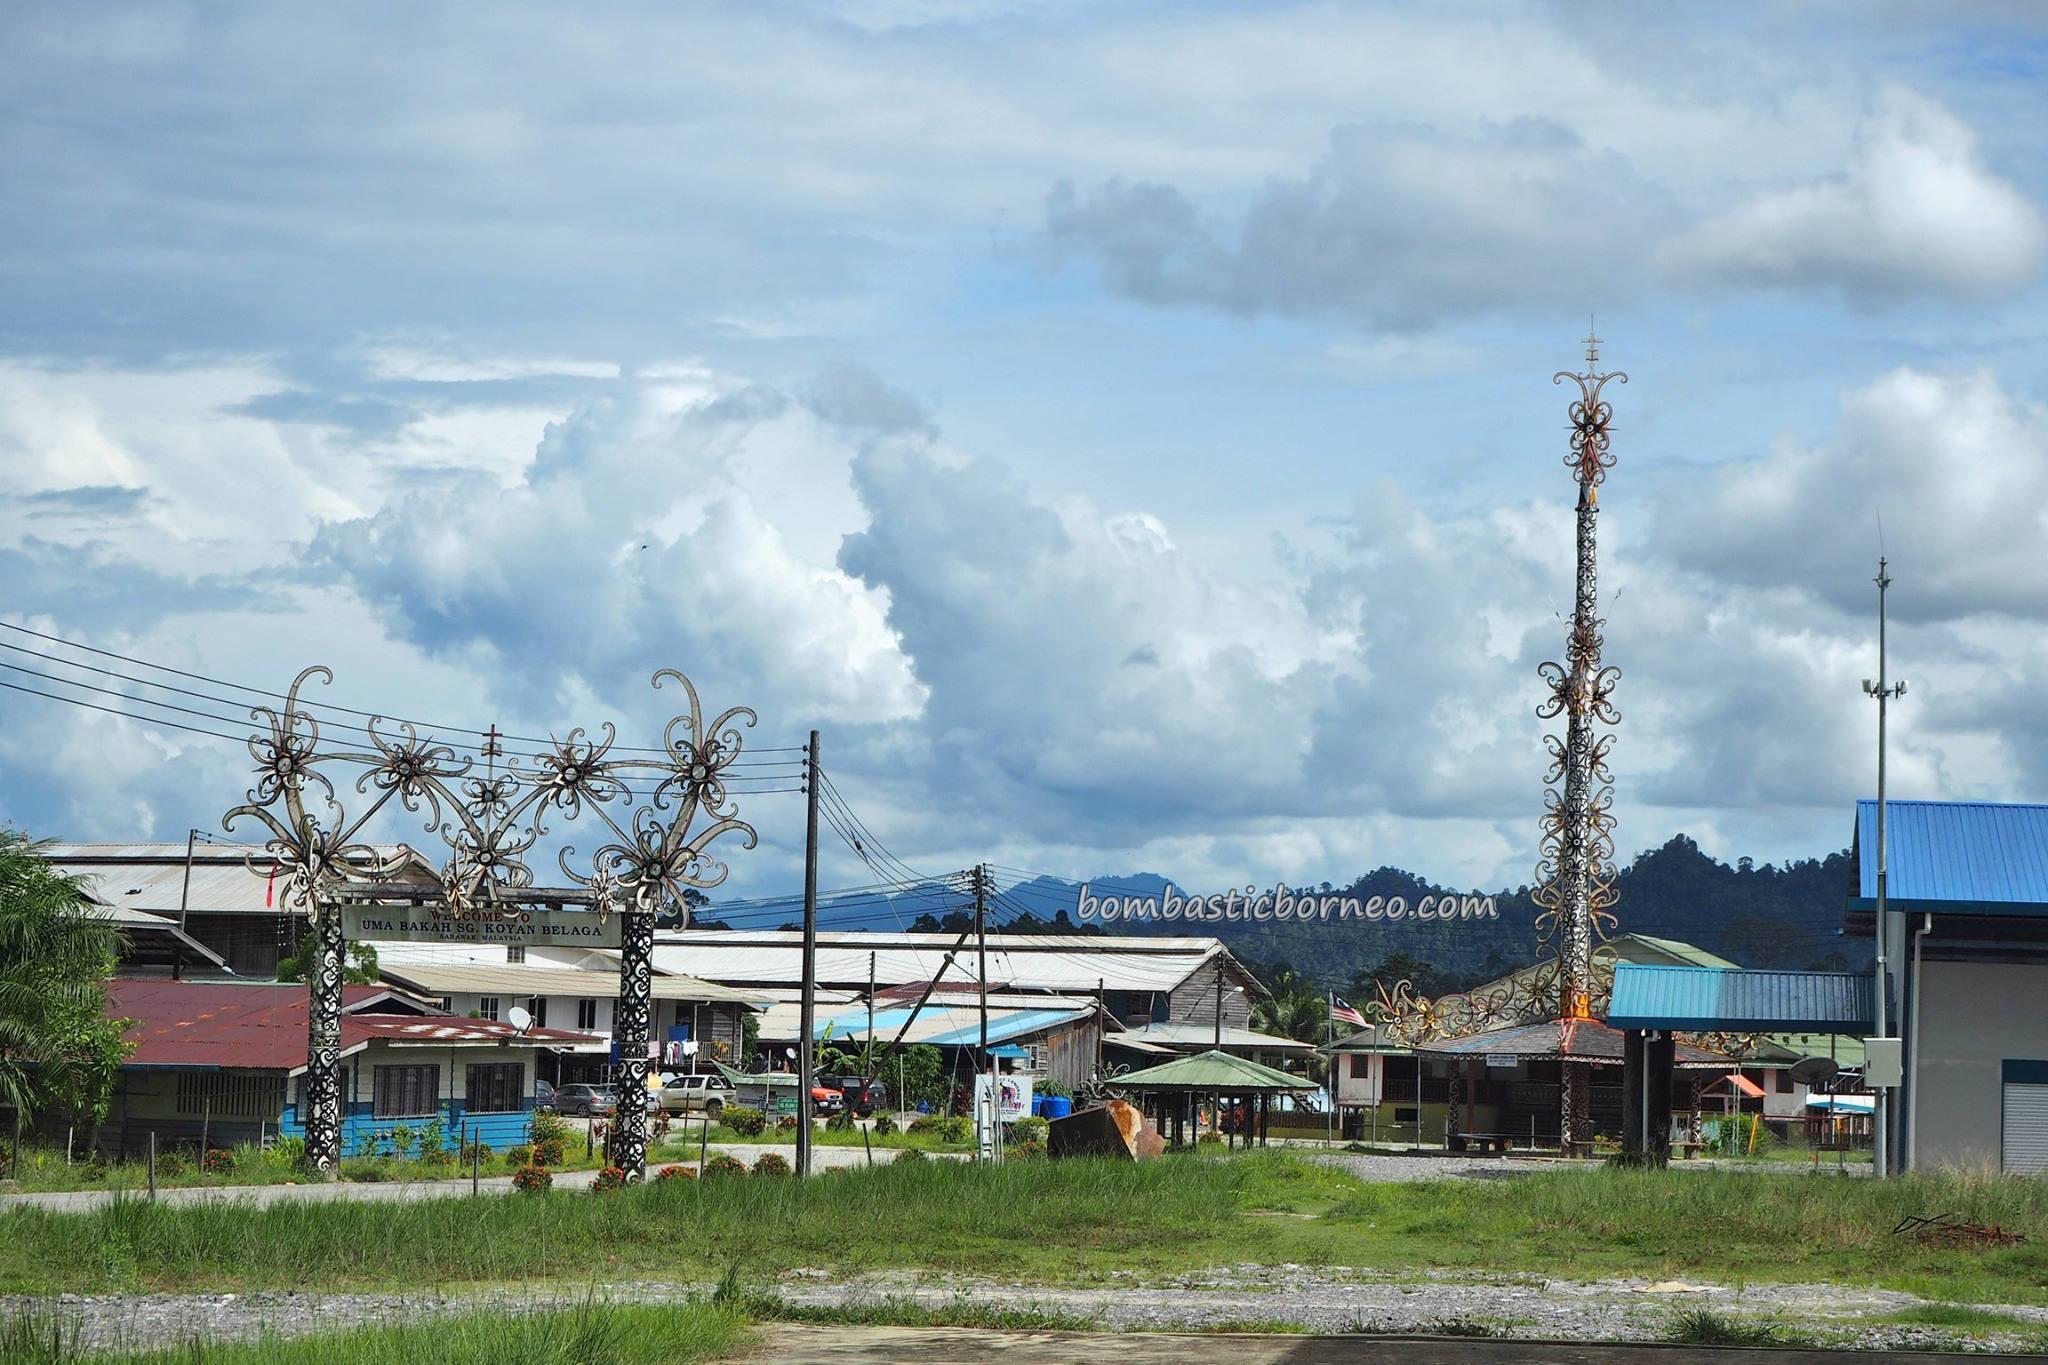 authentic, traditional, culture, Bakun Resettlement Site, Borneo, Sarawak, Malaysia, Sungai Asap, native, tribal, Dayak Kenyah, Tourism, travel guide, village, Uma Baha, Belawing Tower,